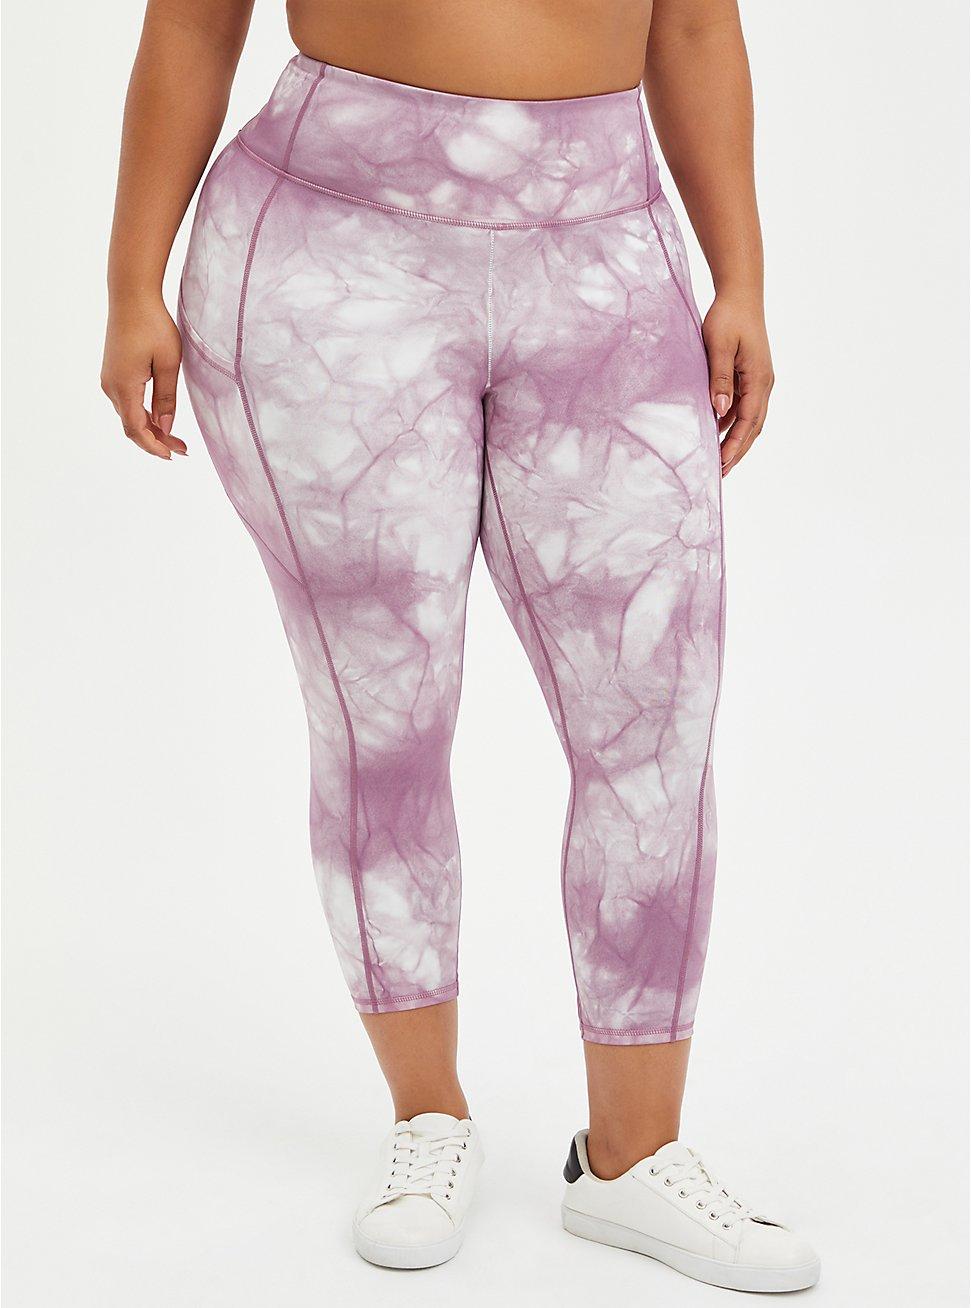 Wicking Active Crop Legging - Tie Dye Purple, TIE DYE, hi-res